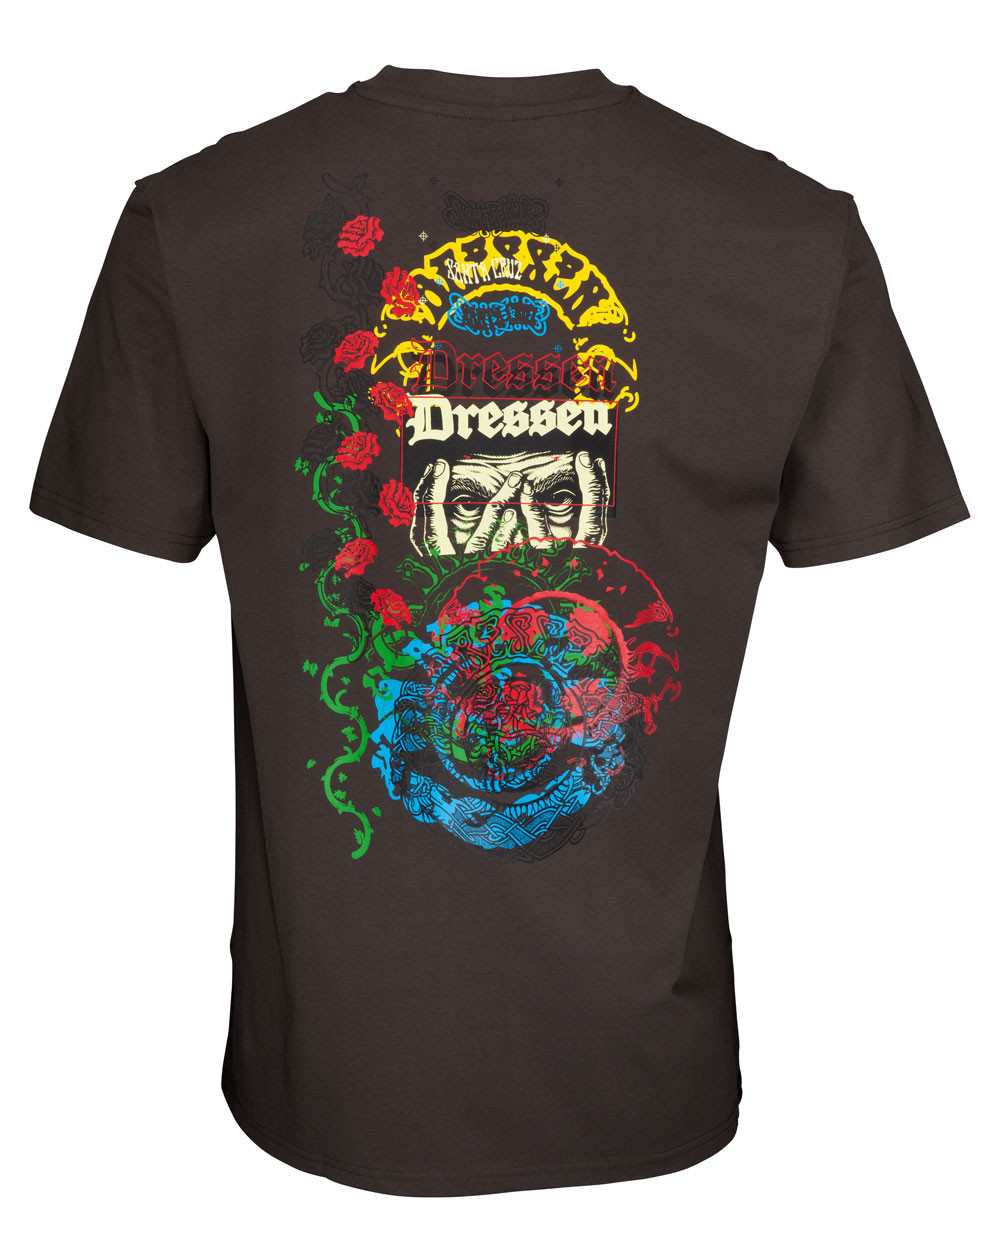 Santa Cruz Dressen Archive T-Shirt Uomo Washed Black